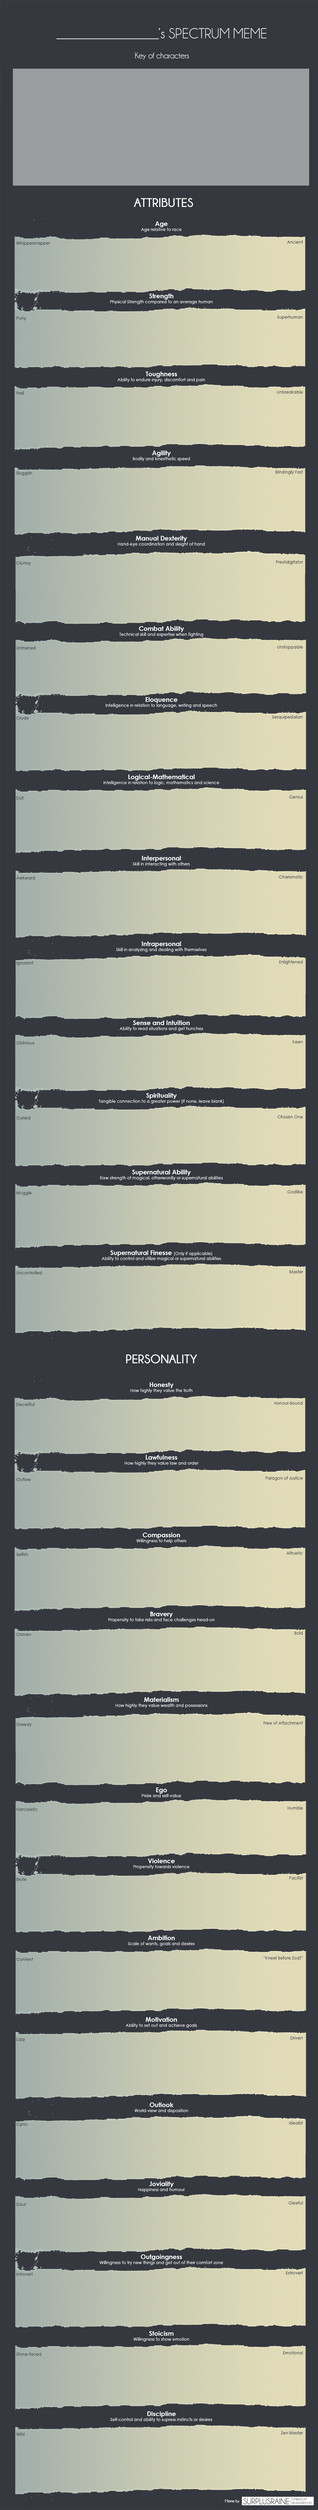 Character Spectrum Meme - Blank Template by SurplusRaine